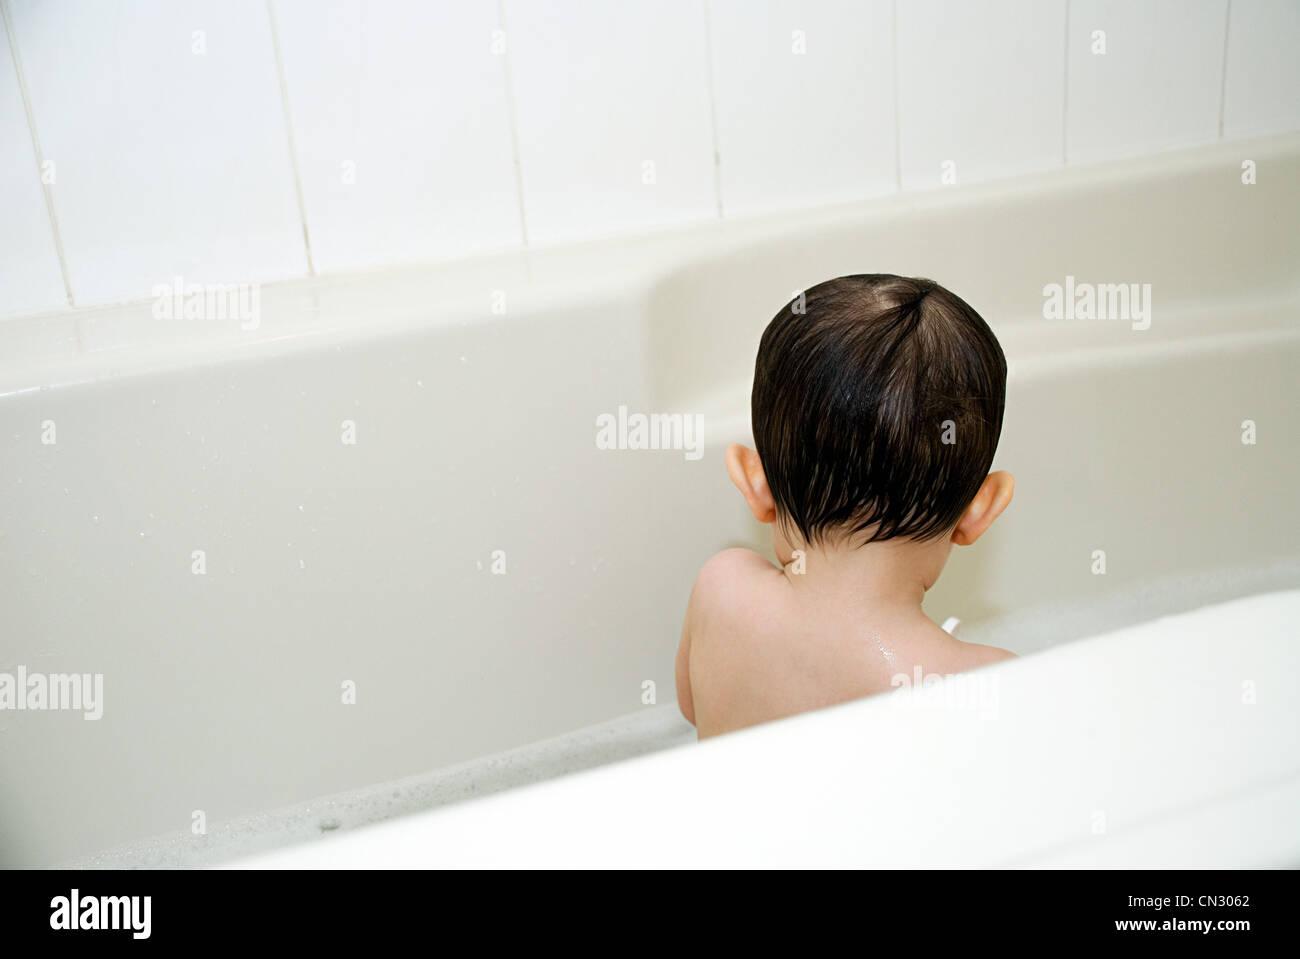 Baby Boy en la bañera. Imagen De Stock